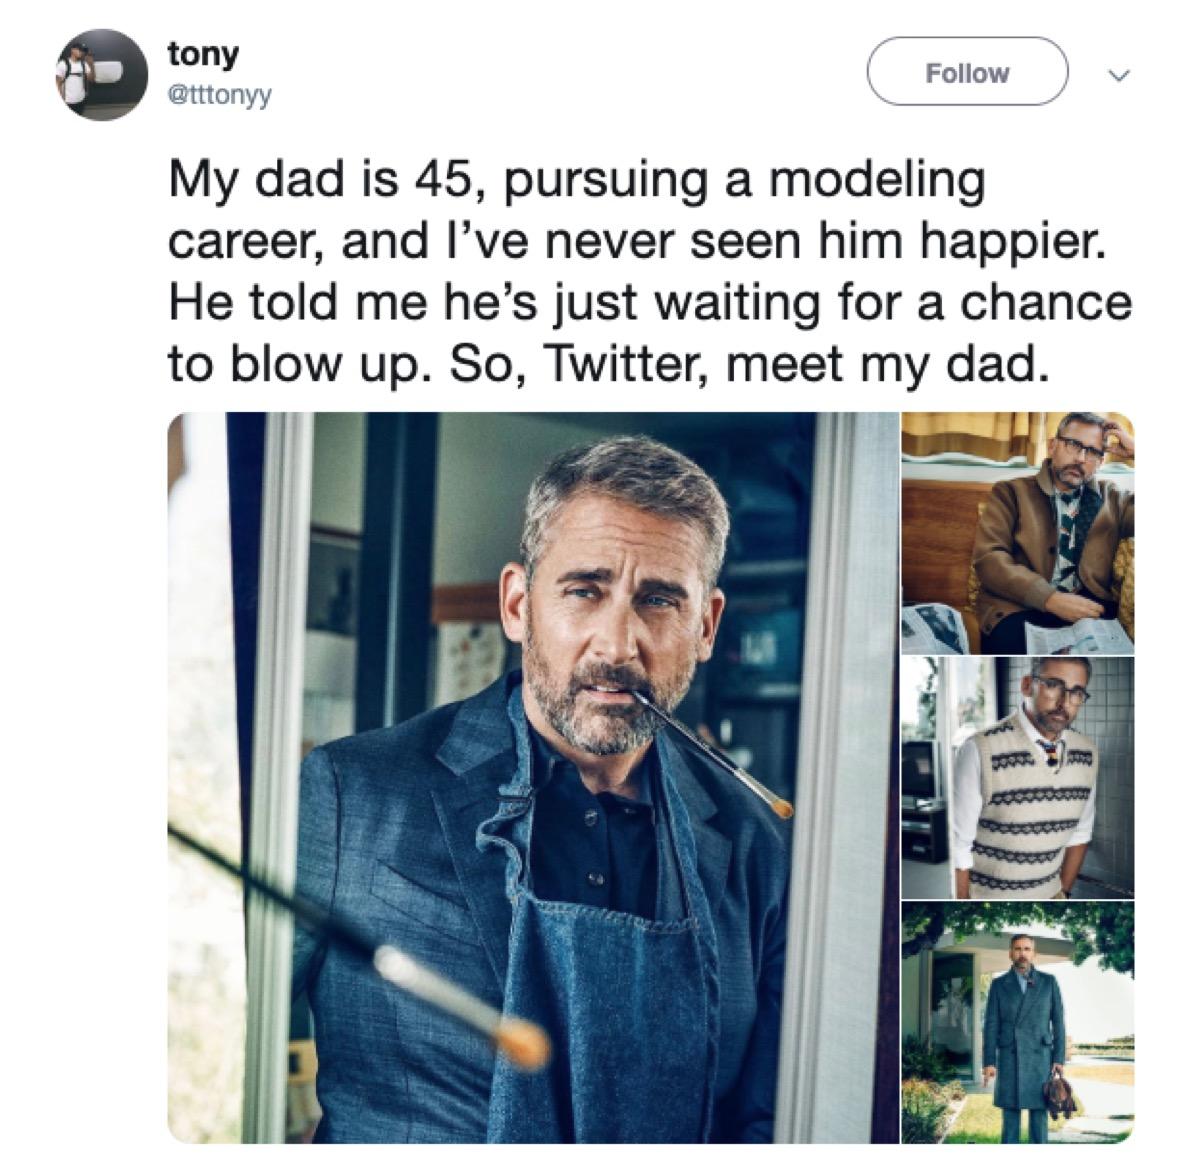 twitter meet my dad, 2019 memes